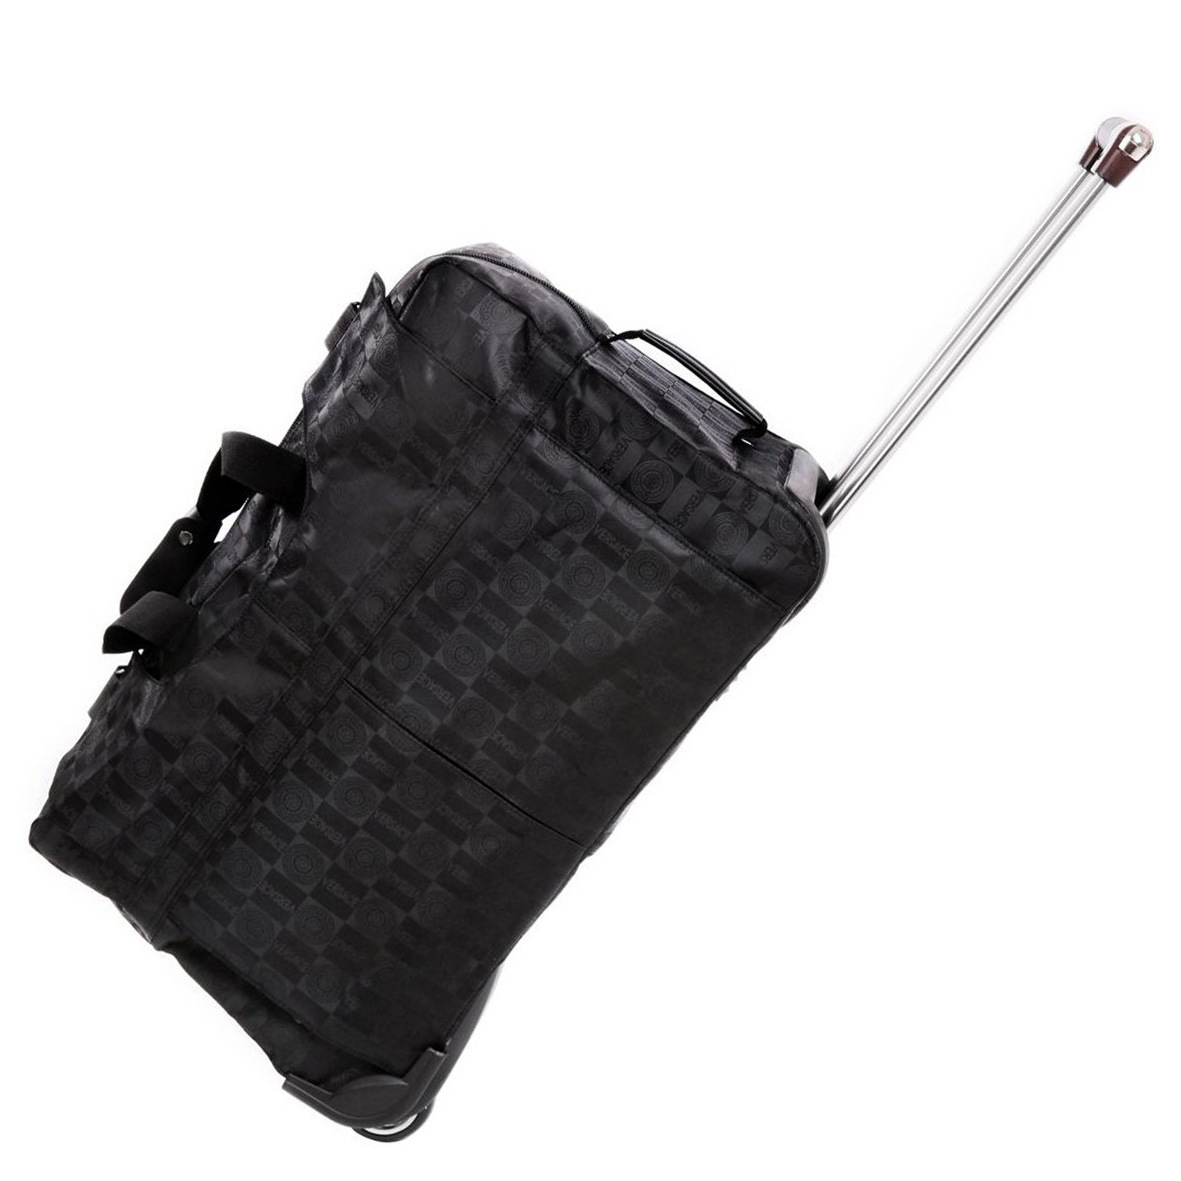 Travel Suitcases Big Capacity Folding Suitcase Travelling Holdall Oxford Waterproof Multifunction Duffle Travel Luggage Set